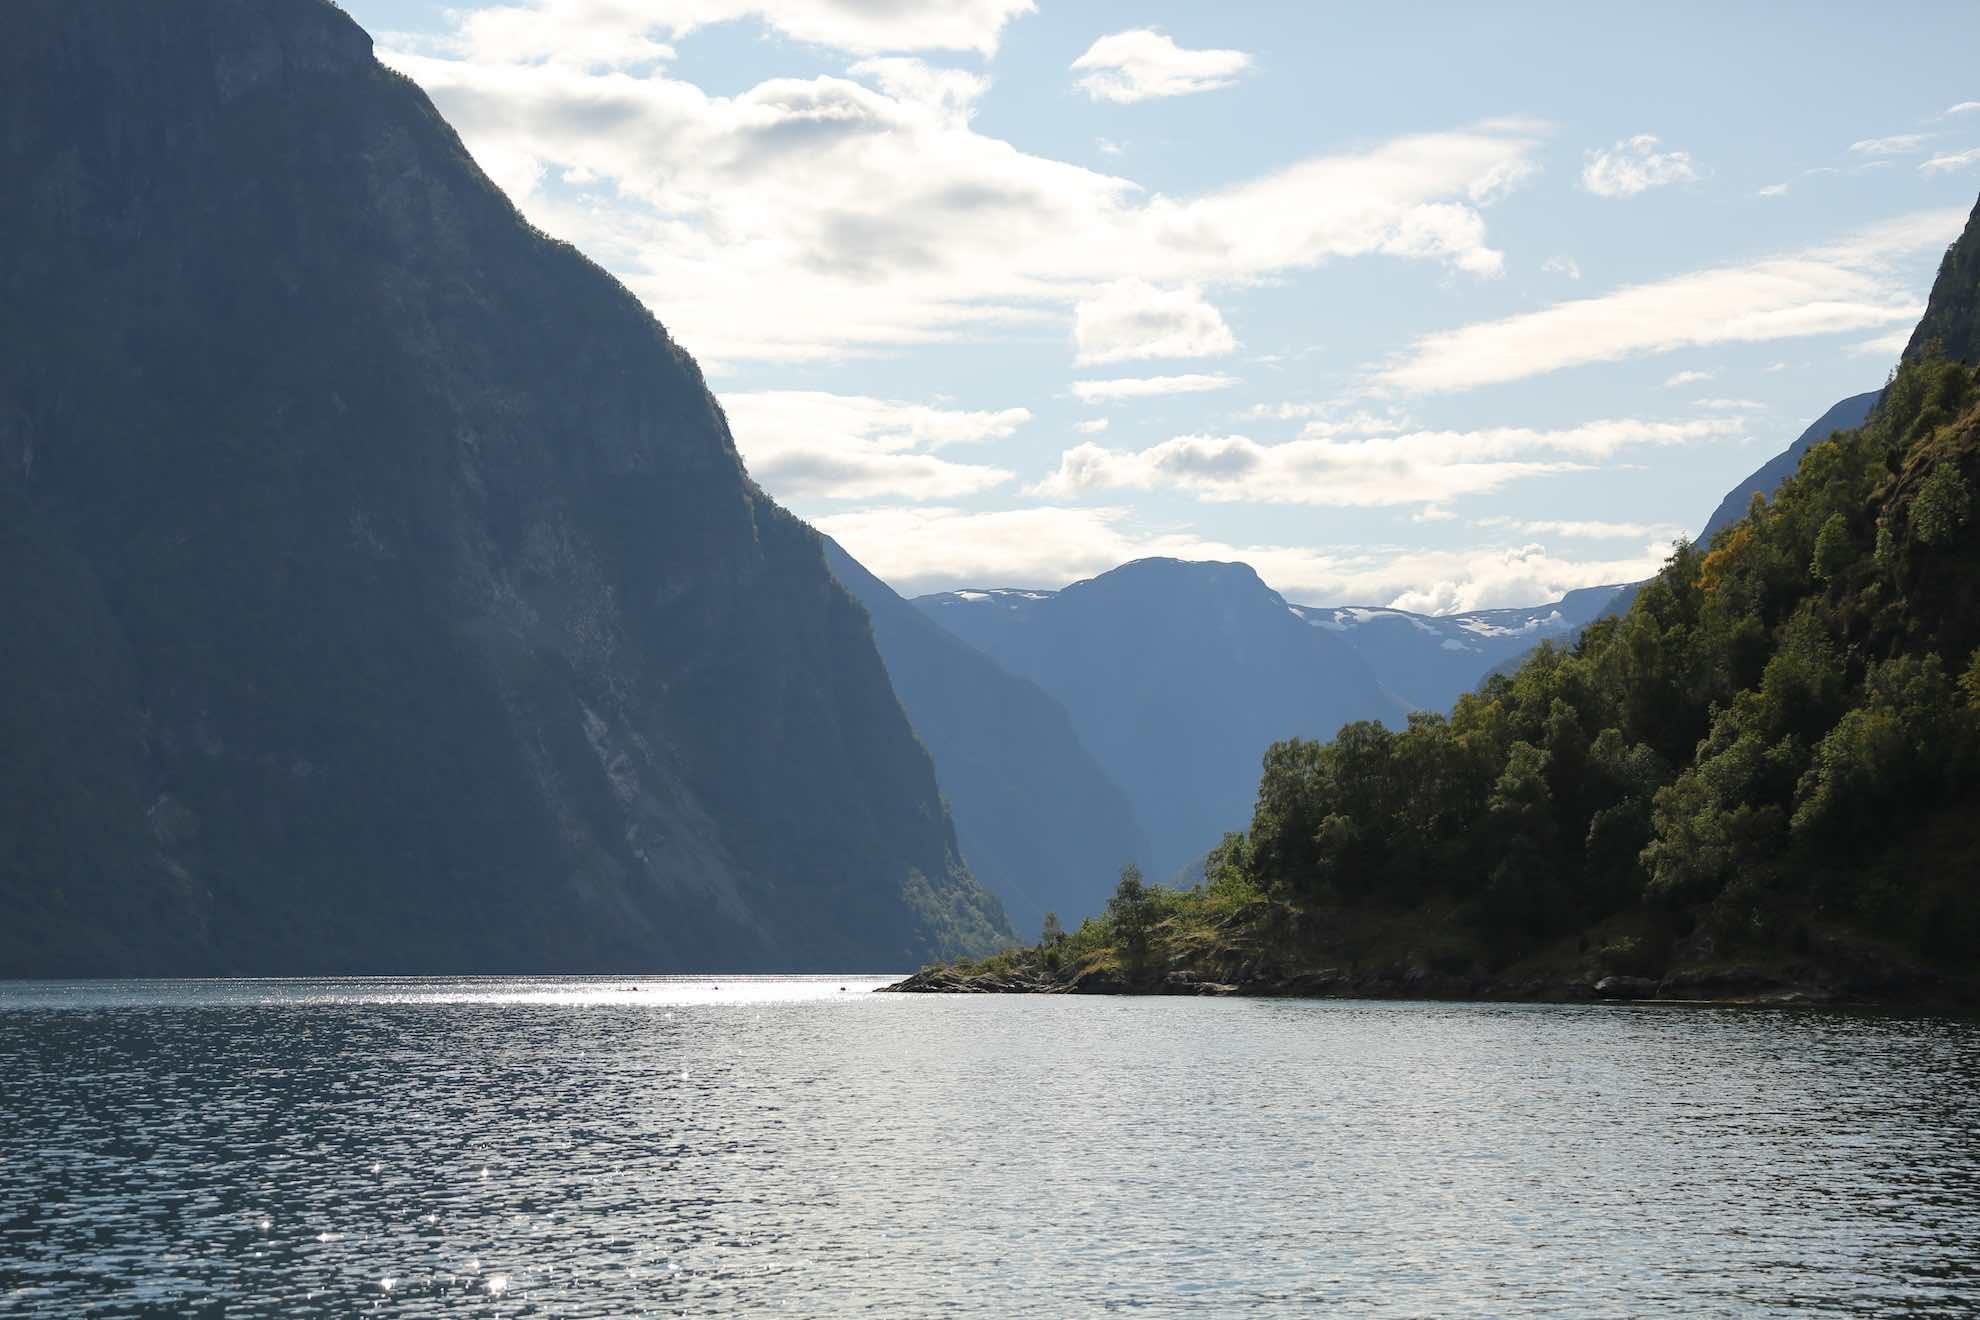 Insgesamt gibt es über 1.000 Fjorde in Norwegen.